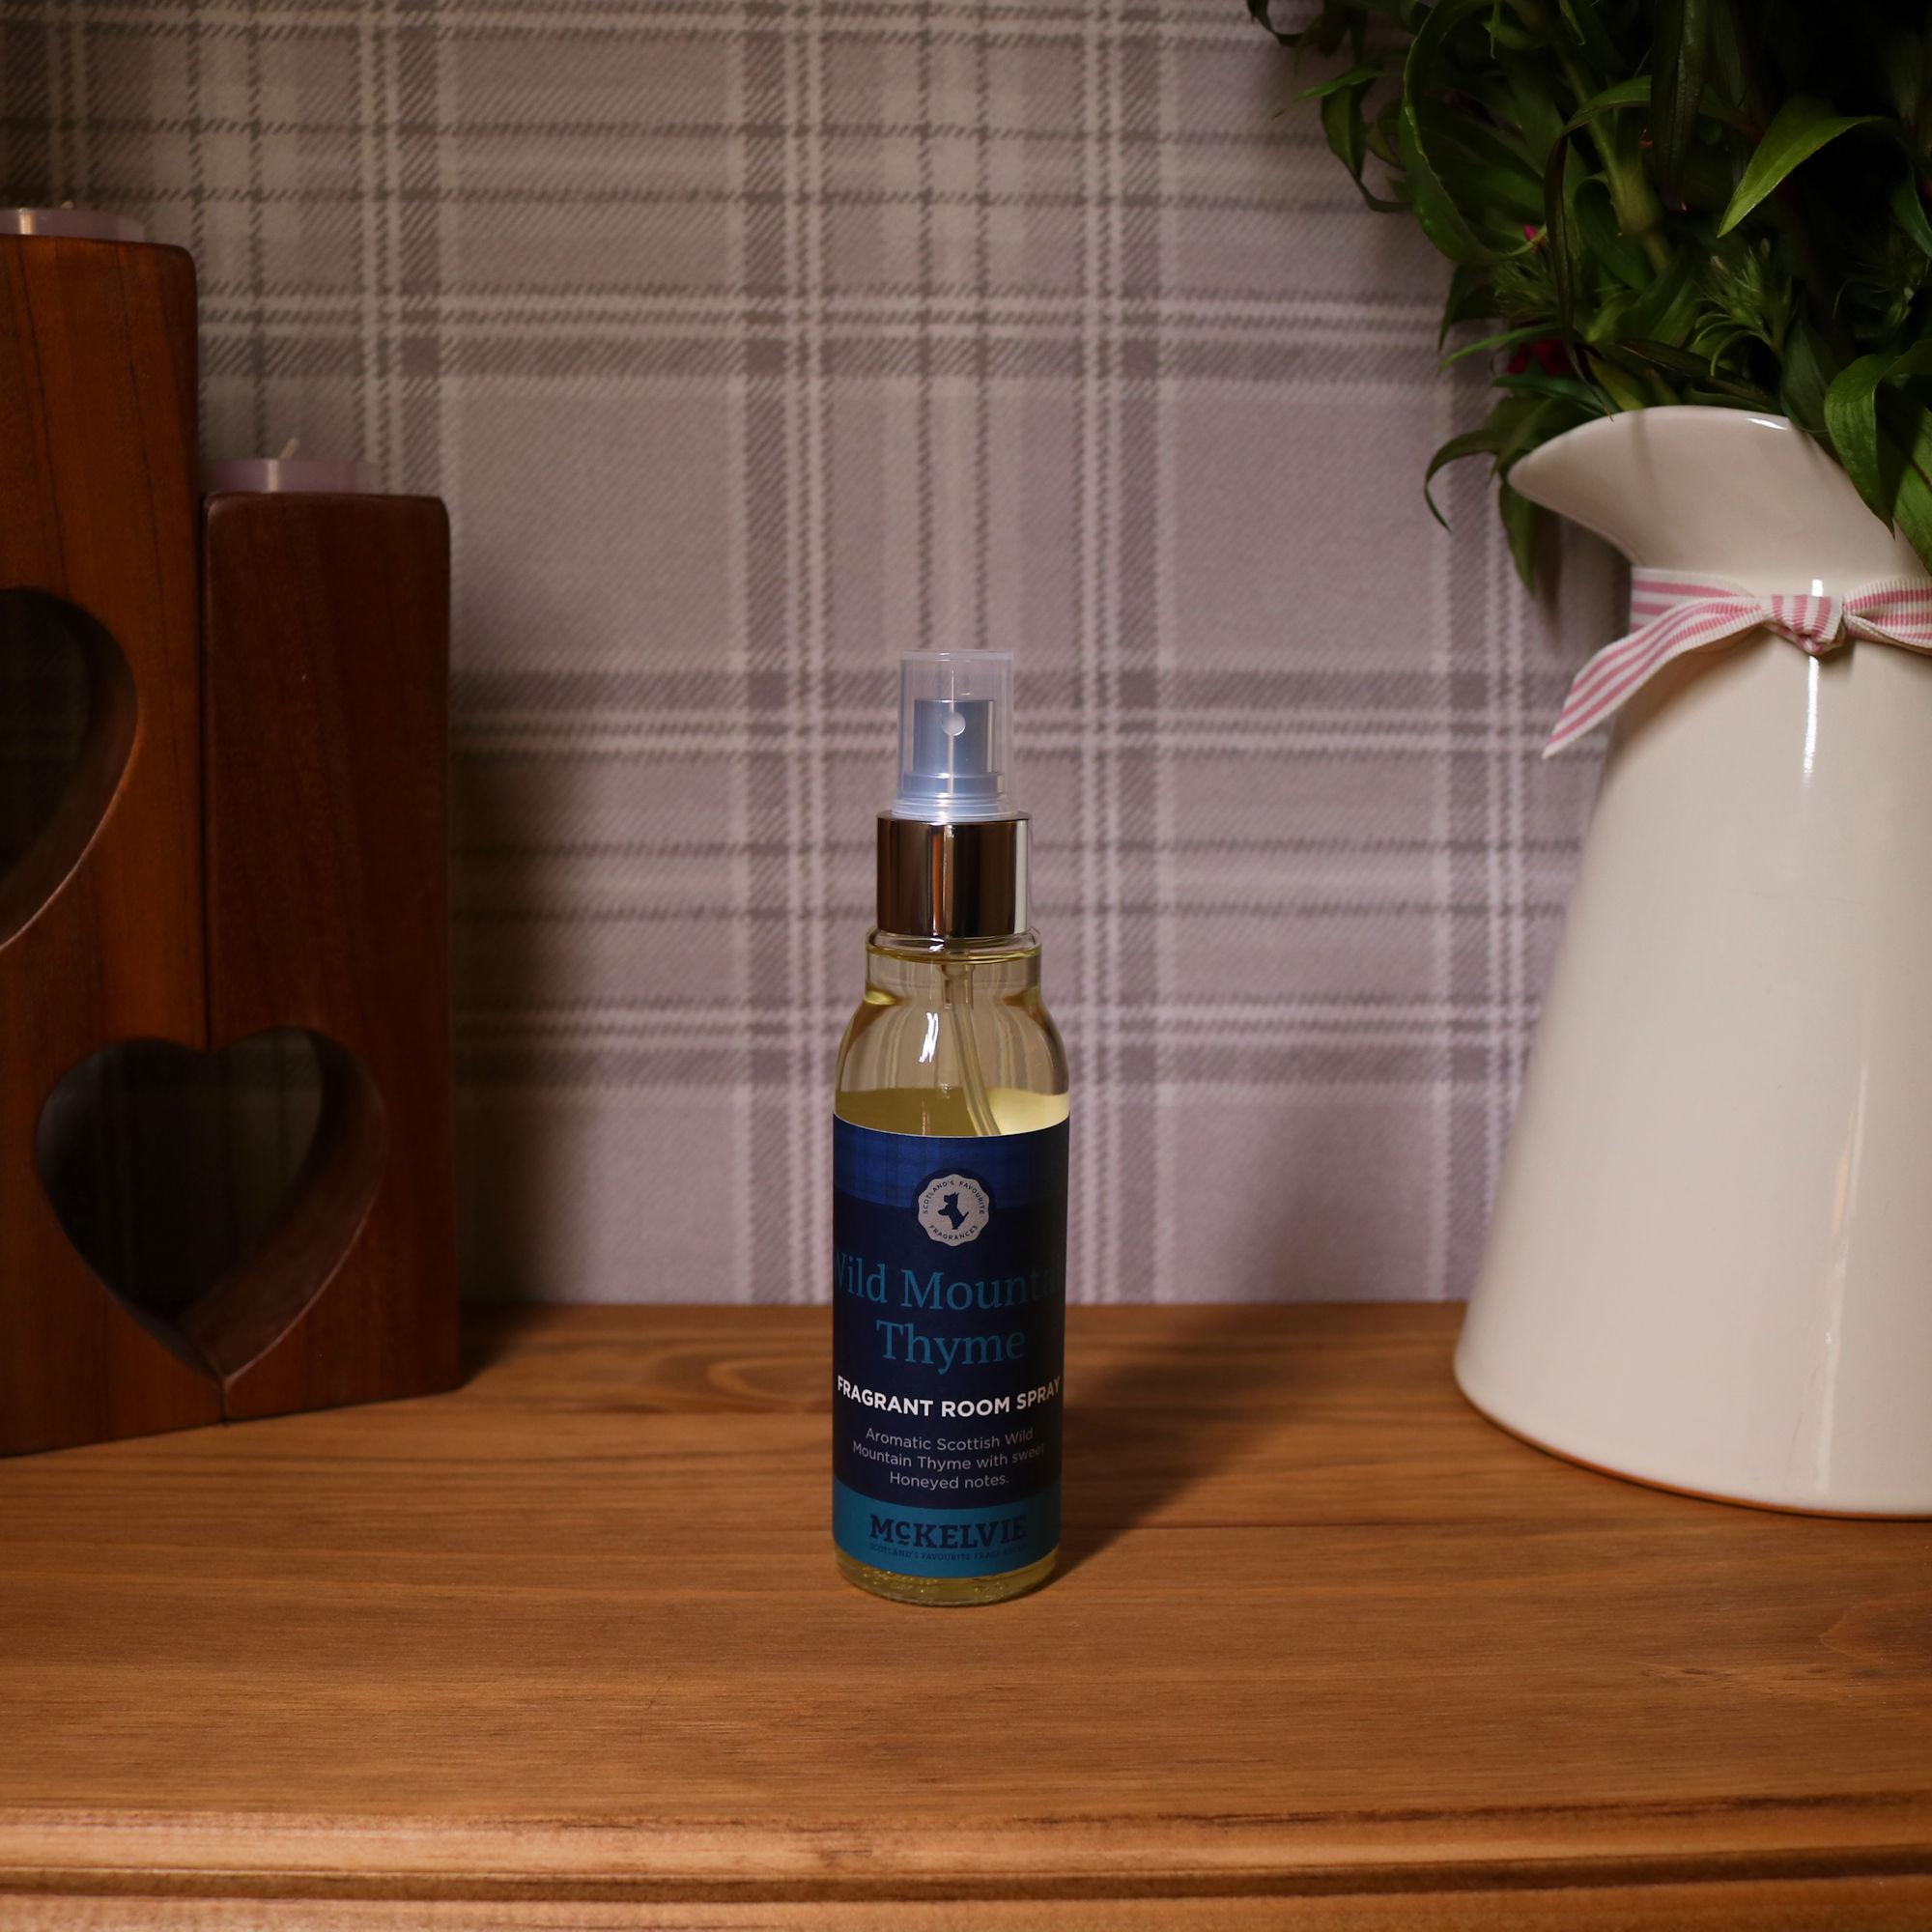 Wild Mountain Thyme Fragrant Room Spray